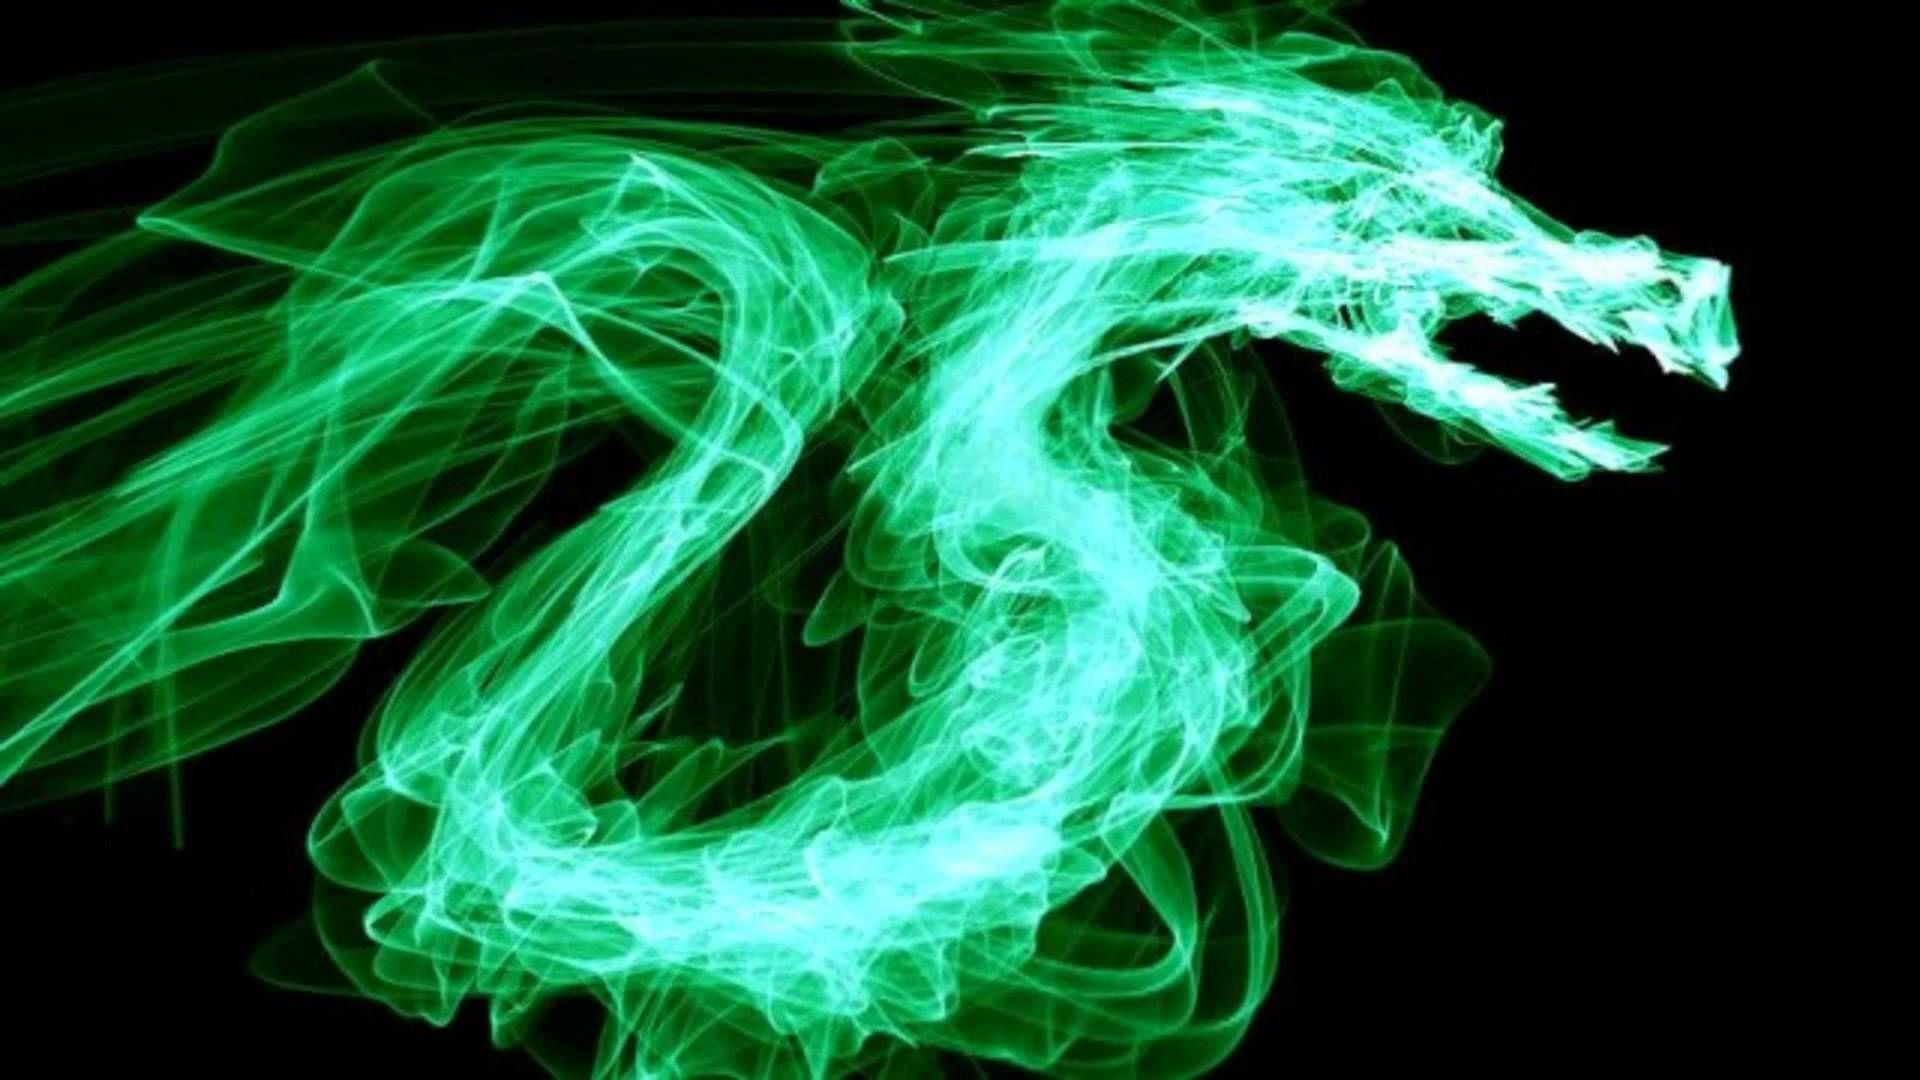 The Green Dragon Marlborough London Green Dragon Fire Dragon Green Aesthetic